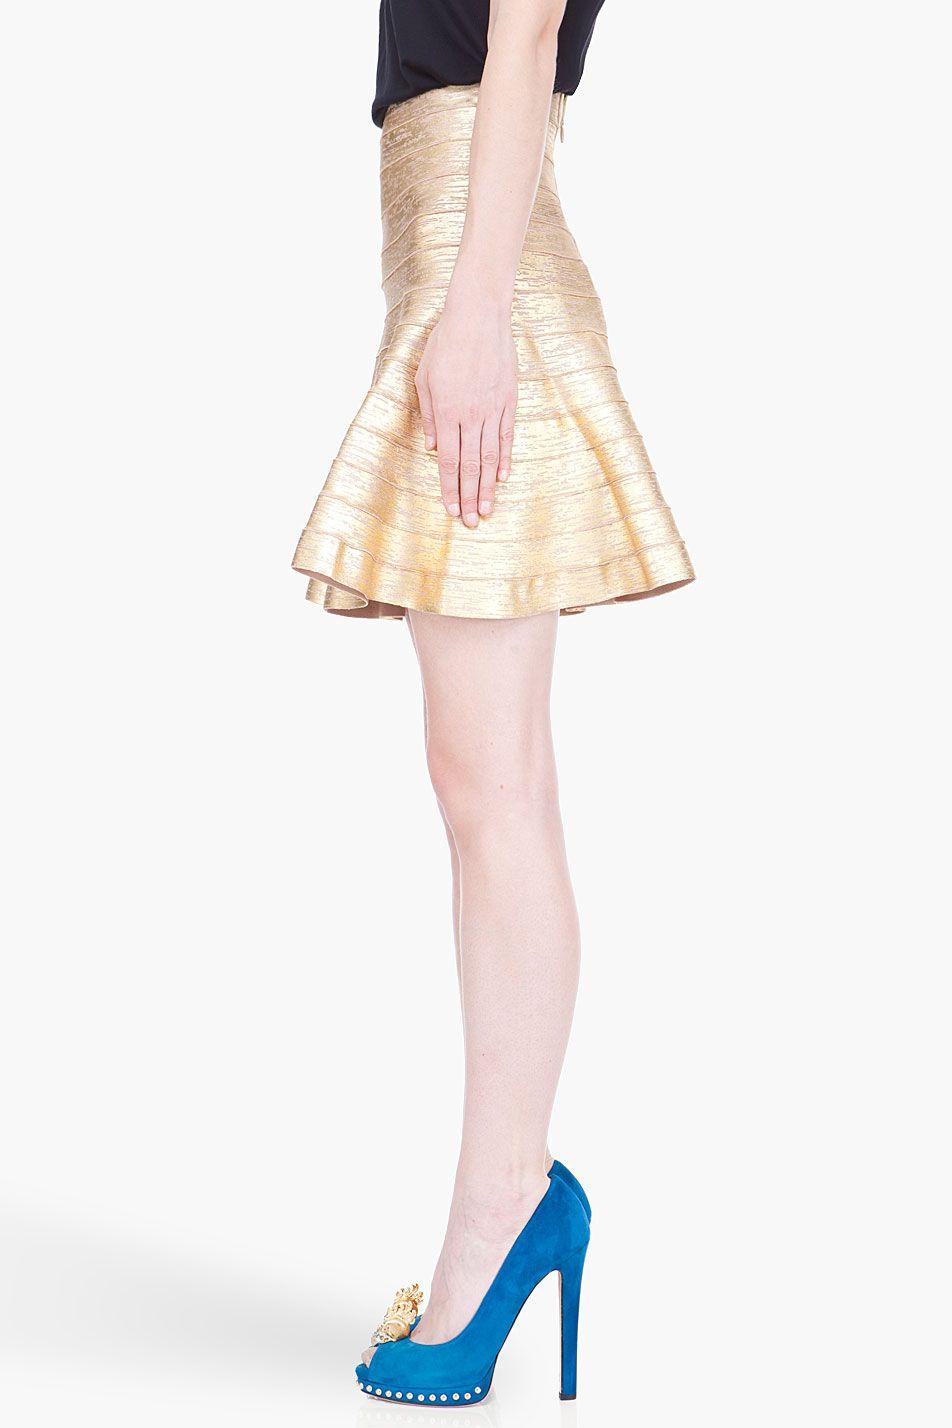 Herve leger gold distressed paneled skirt wish list pinterest